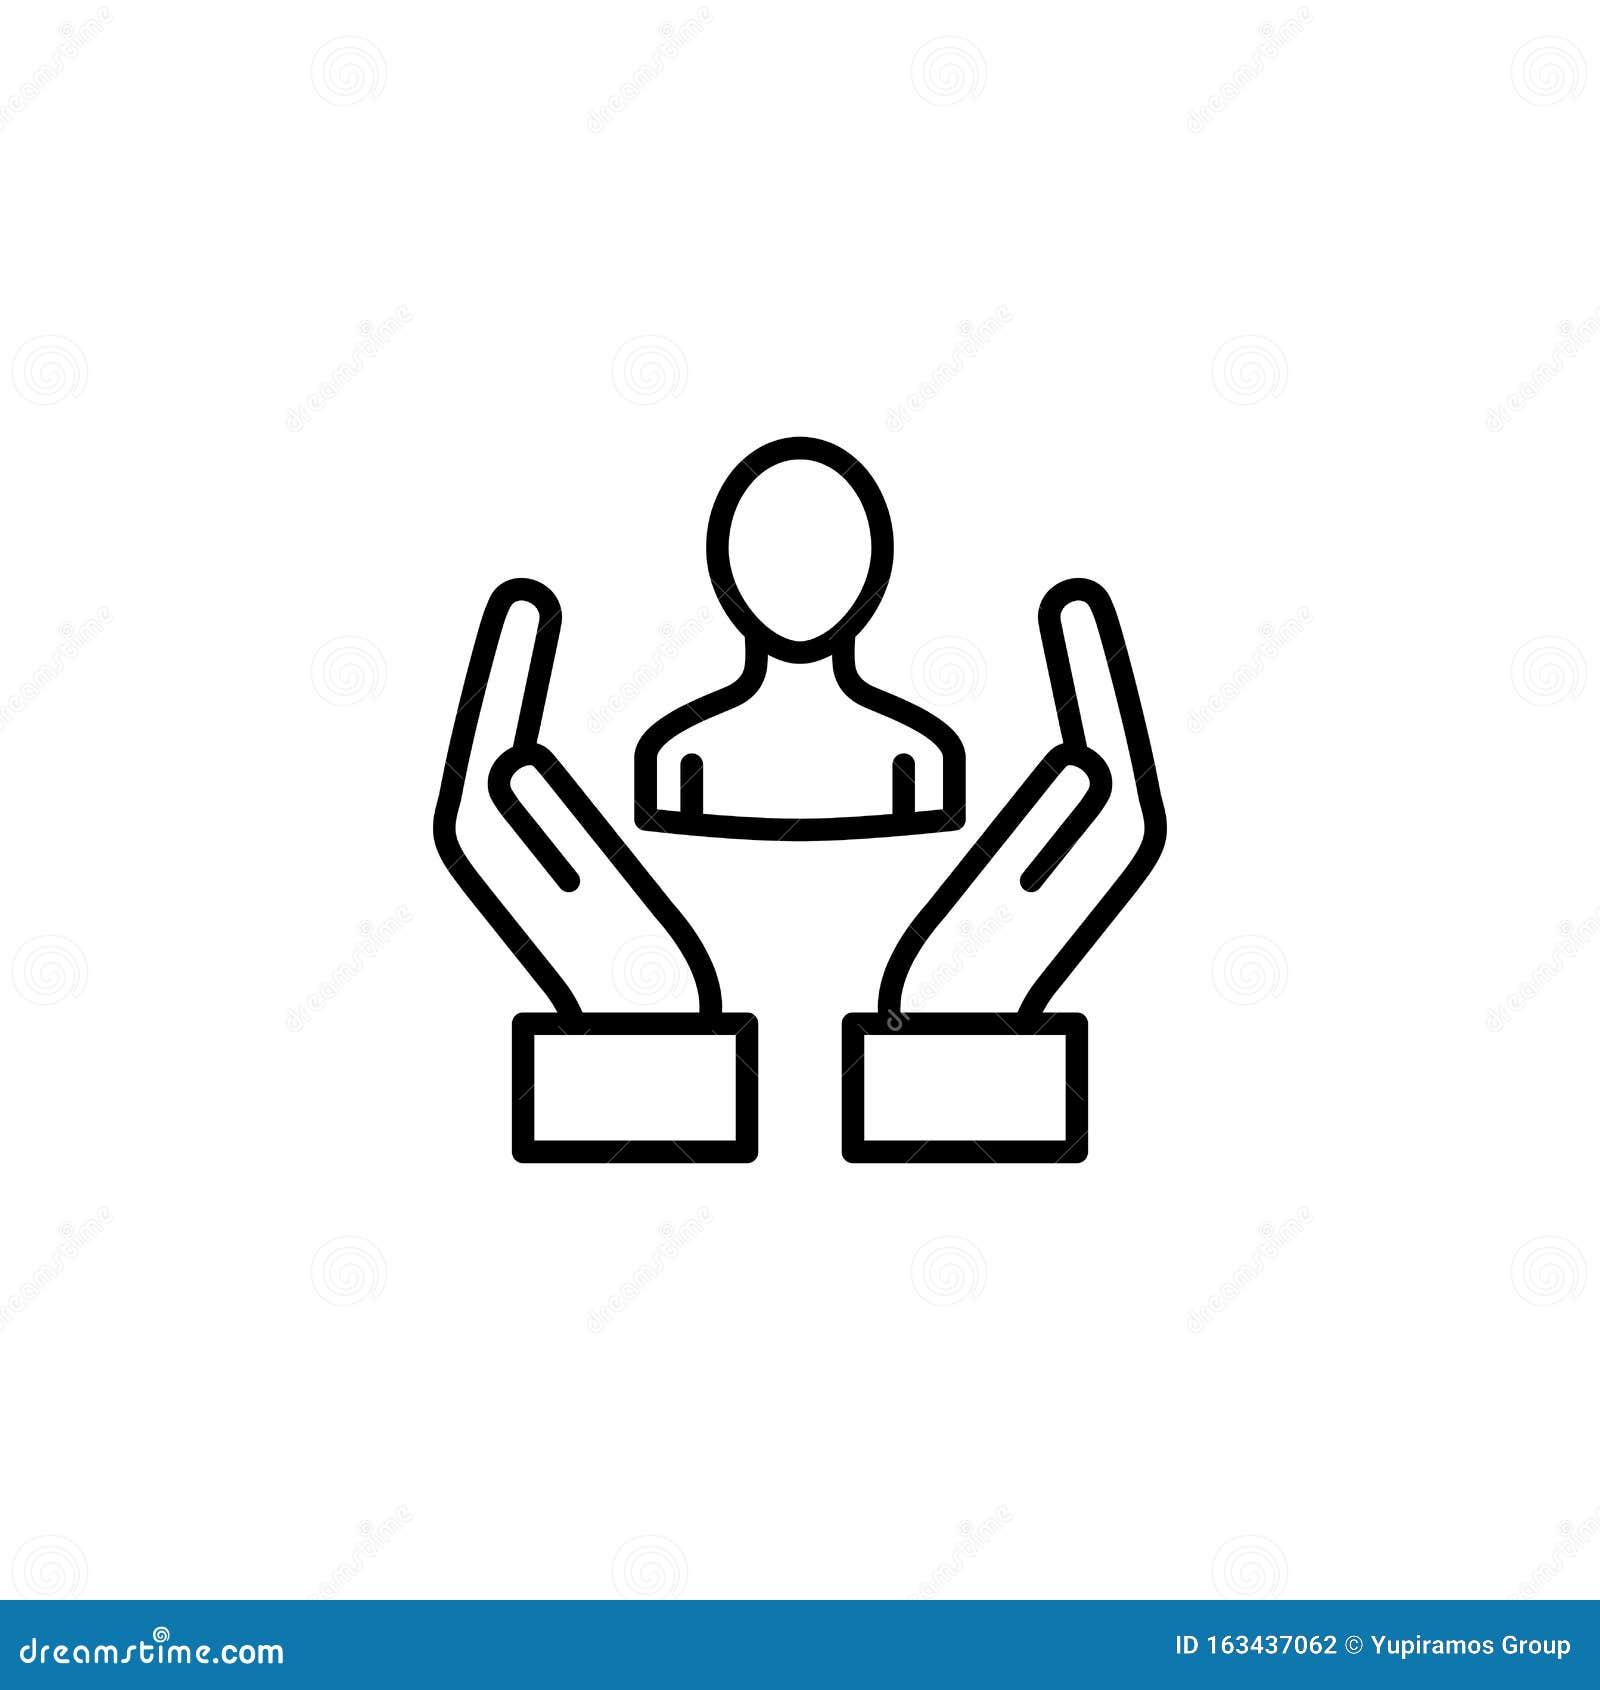 Social media avatar icon line design